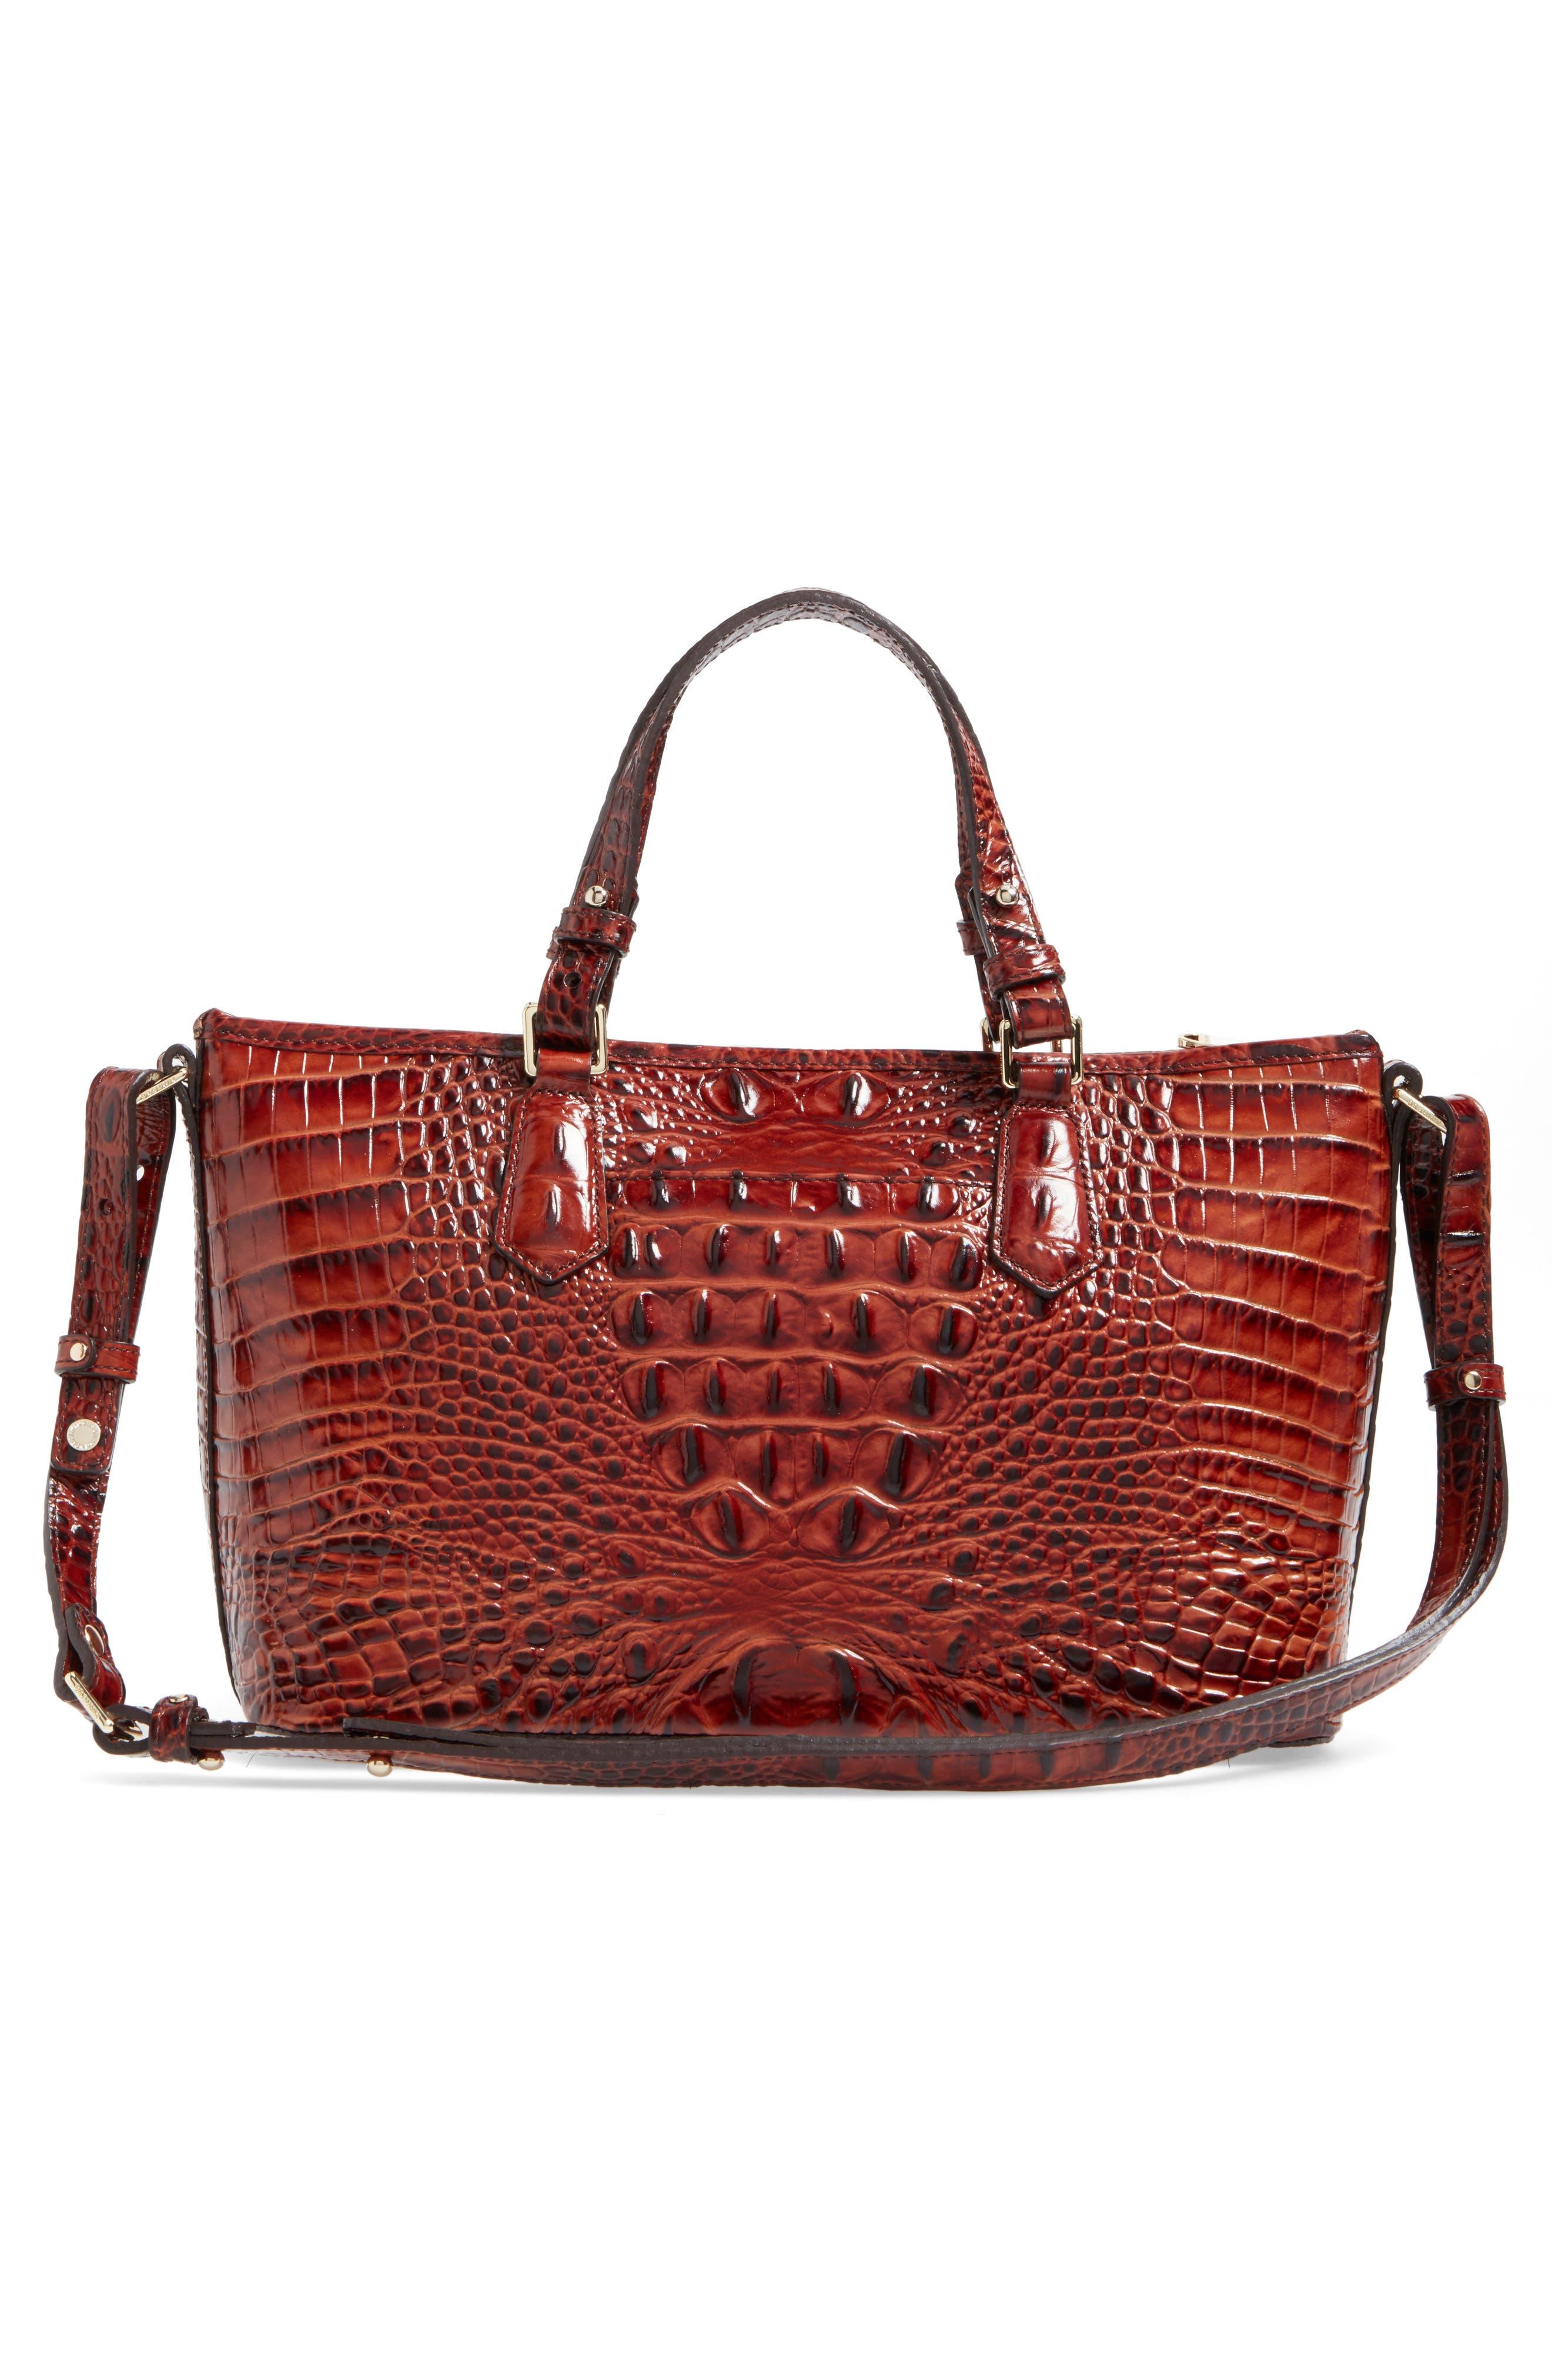 55a16eedc2ed Brahmin Handbags